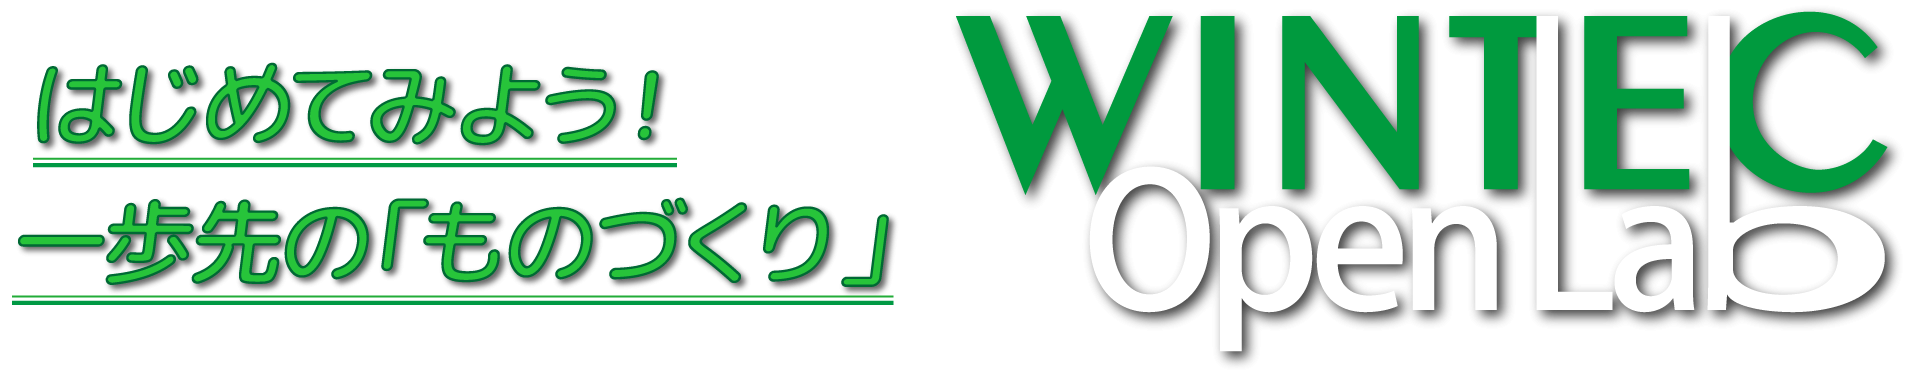 logo_plus_text.png